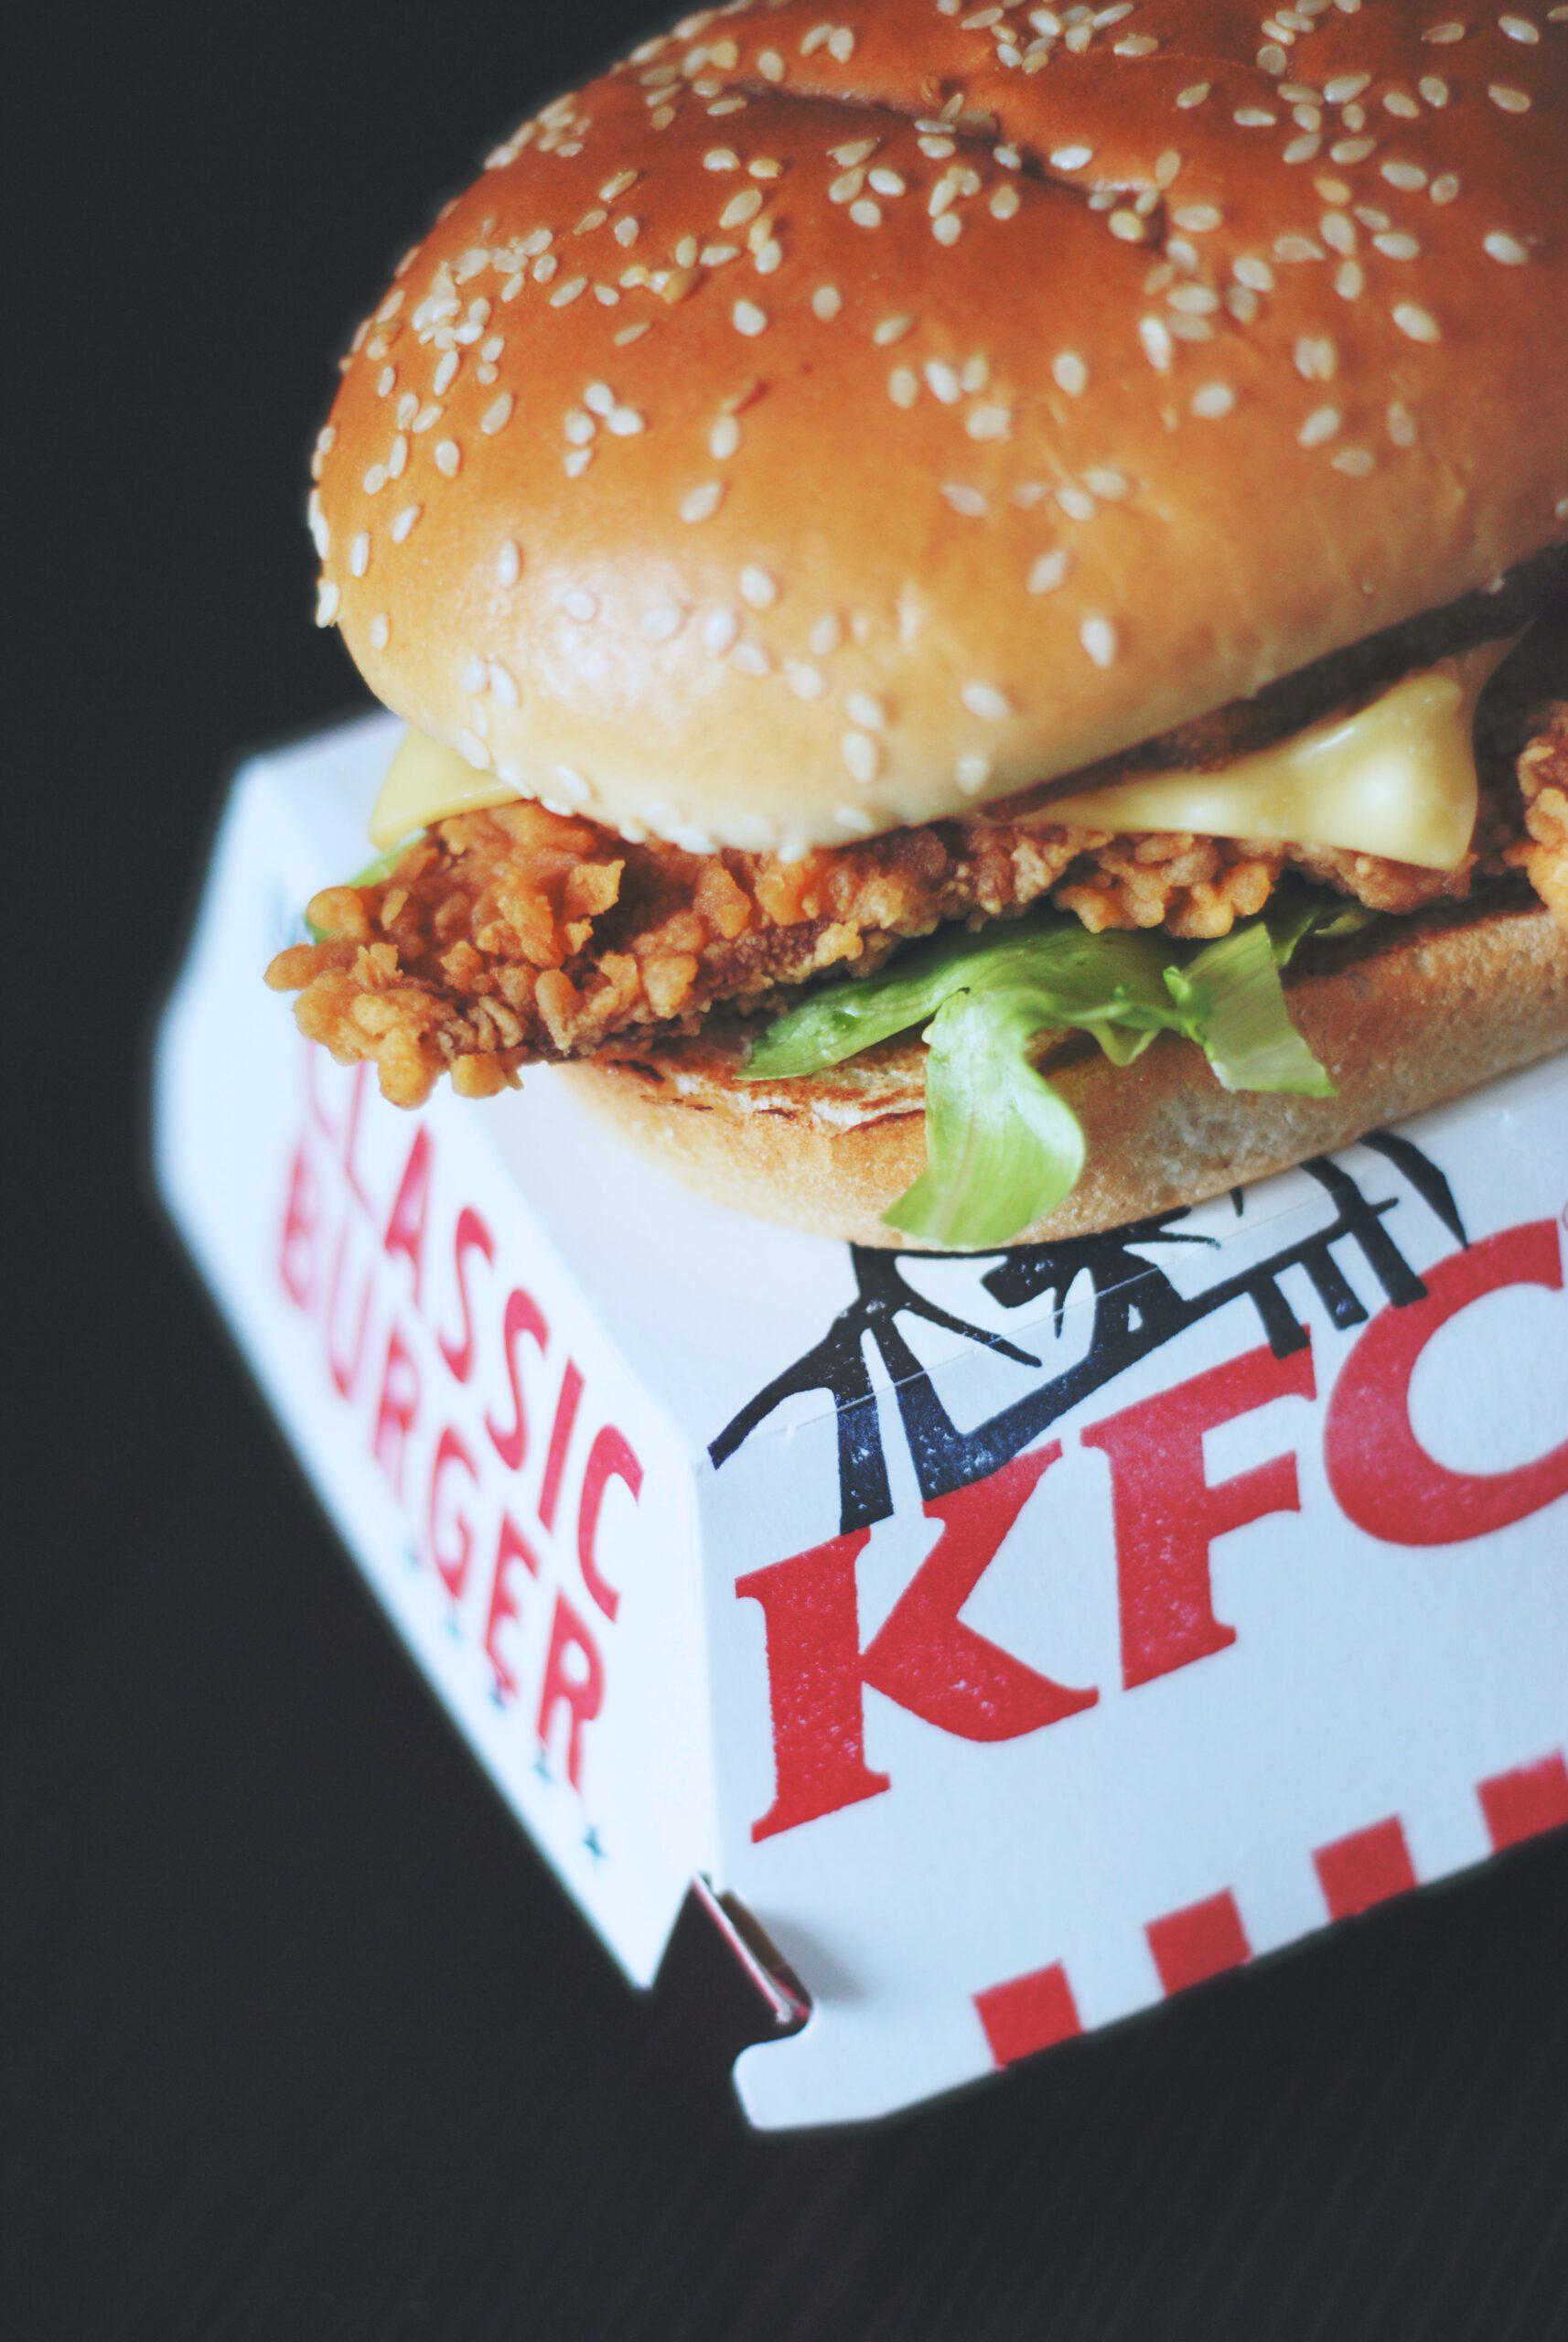 KFC hamburger and box